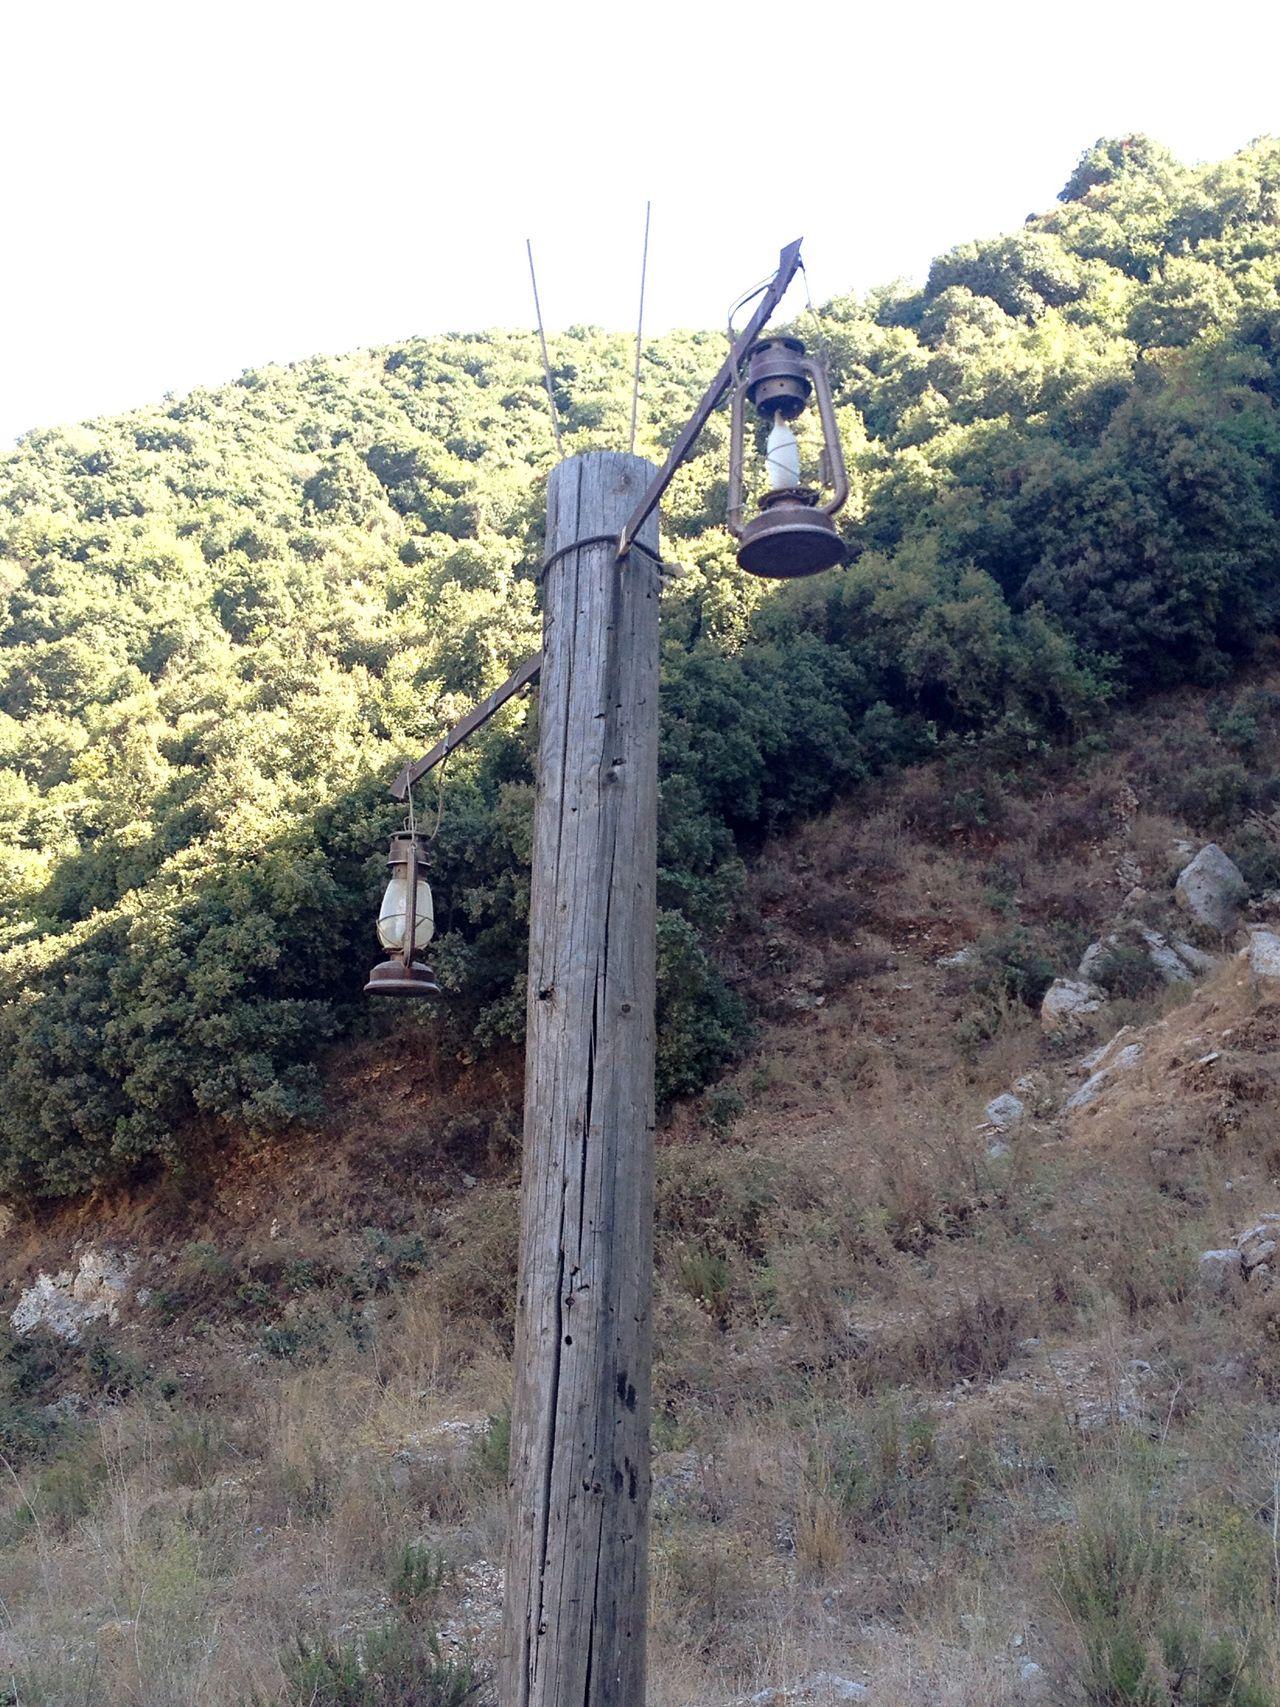 Improvising Lanterns on Electricity Pole Lebanon Urban Decay